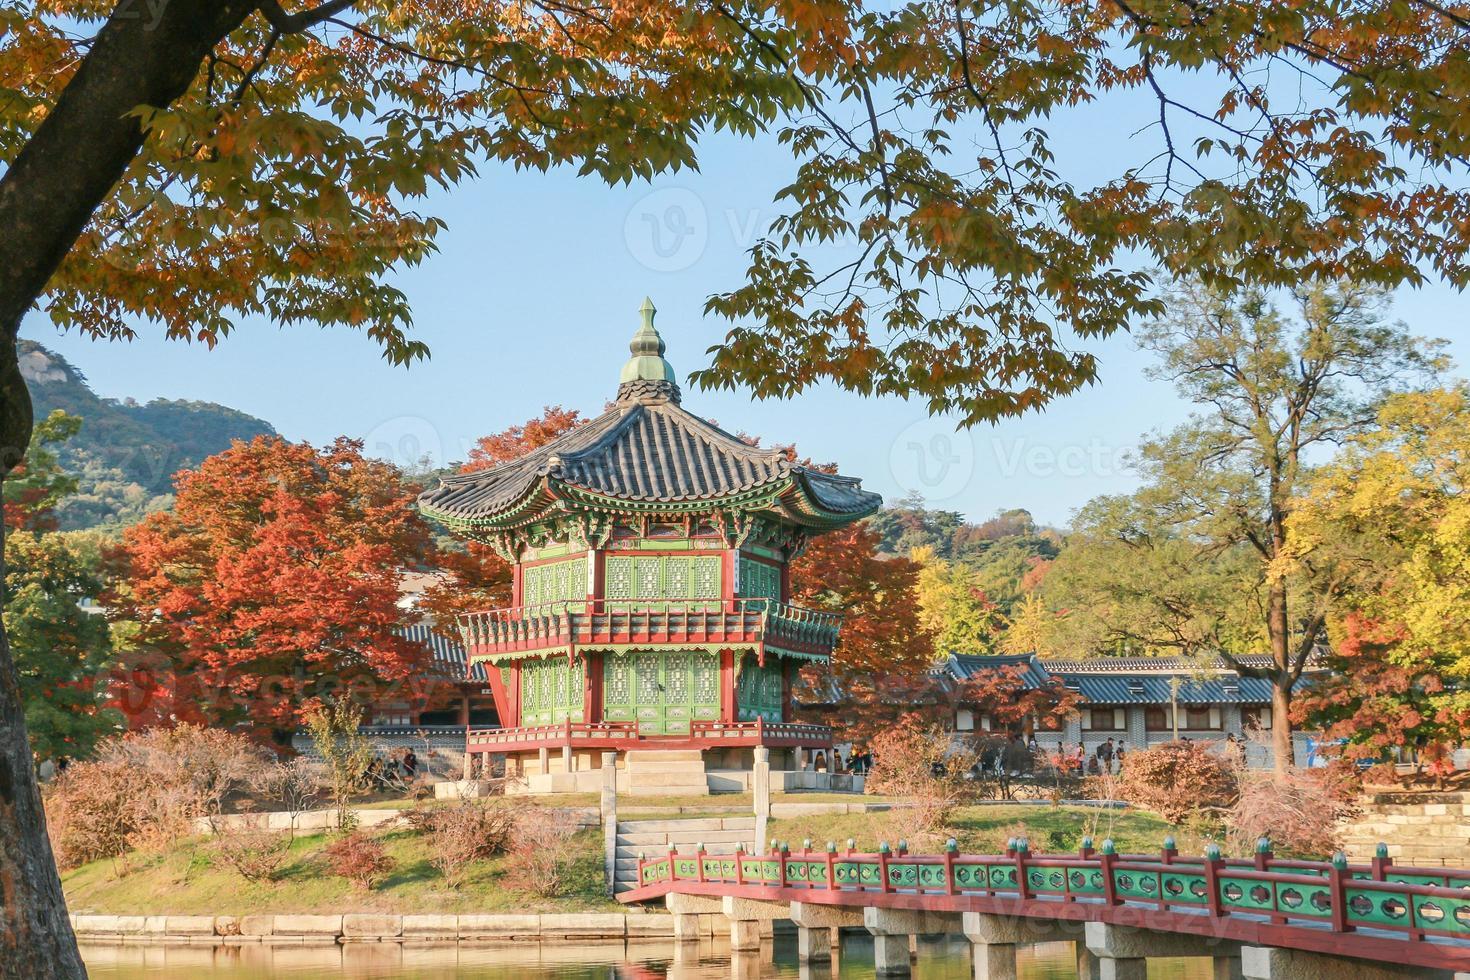 gyeongbokgung palace séoul coréen photo